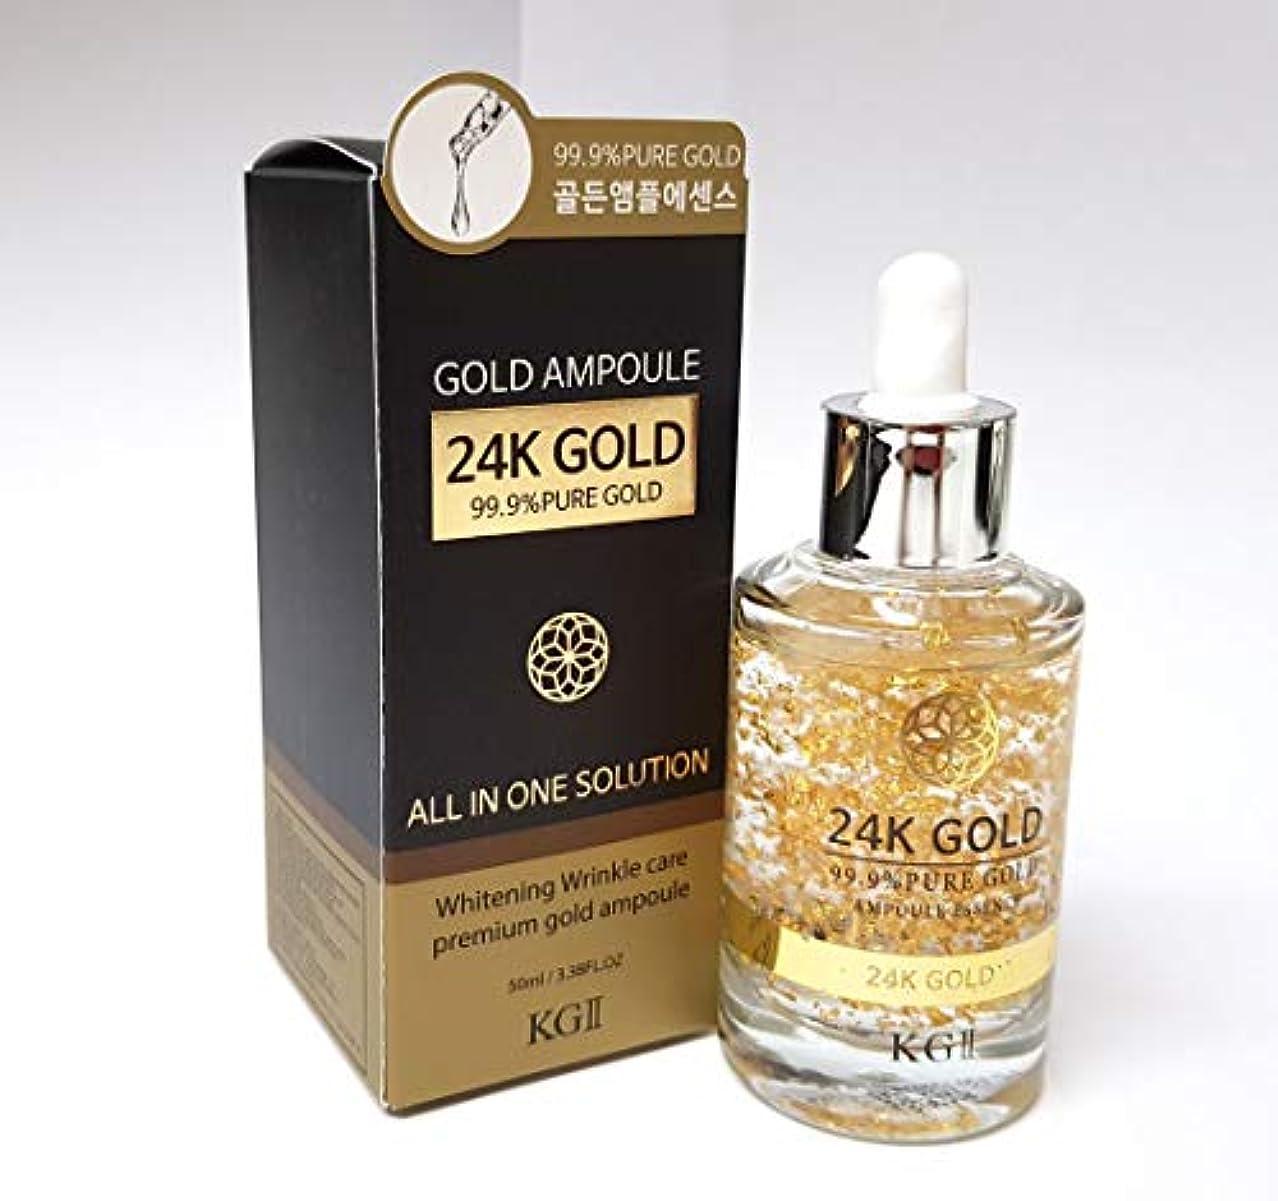 [KG2] 24Kゴールドアンプルエッセンス50ml / 24K Gold Ampoule Essence 50ml / 99.9ピュアゴールド / 99.9Pure Gold/シワ&ホワイトニング/wrinkles &...